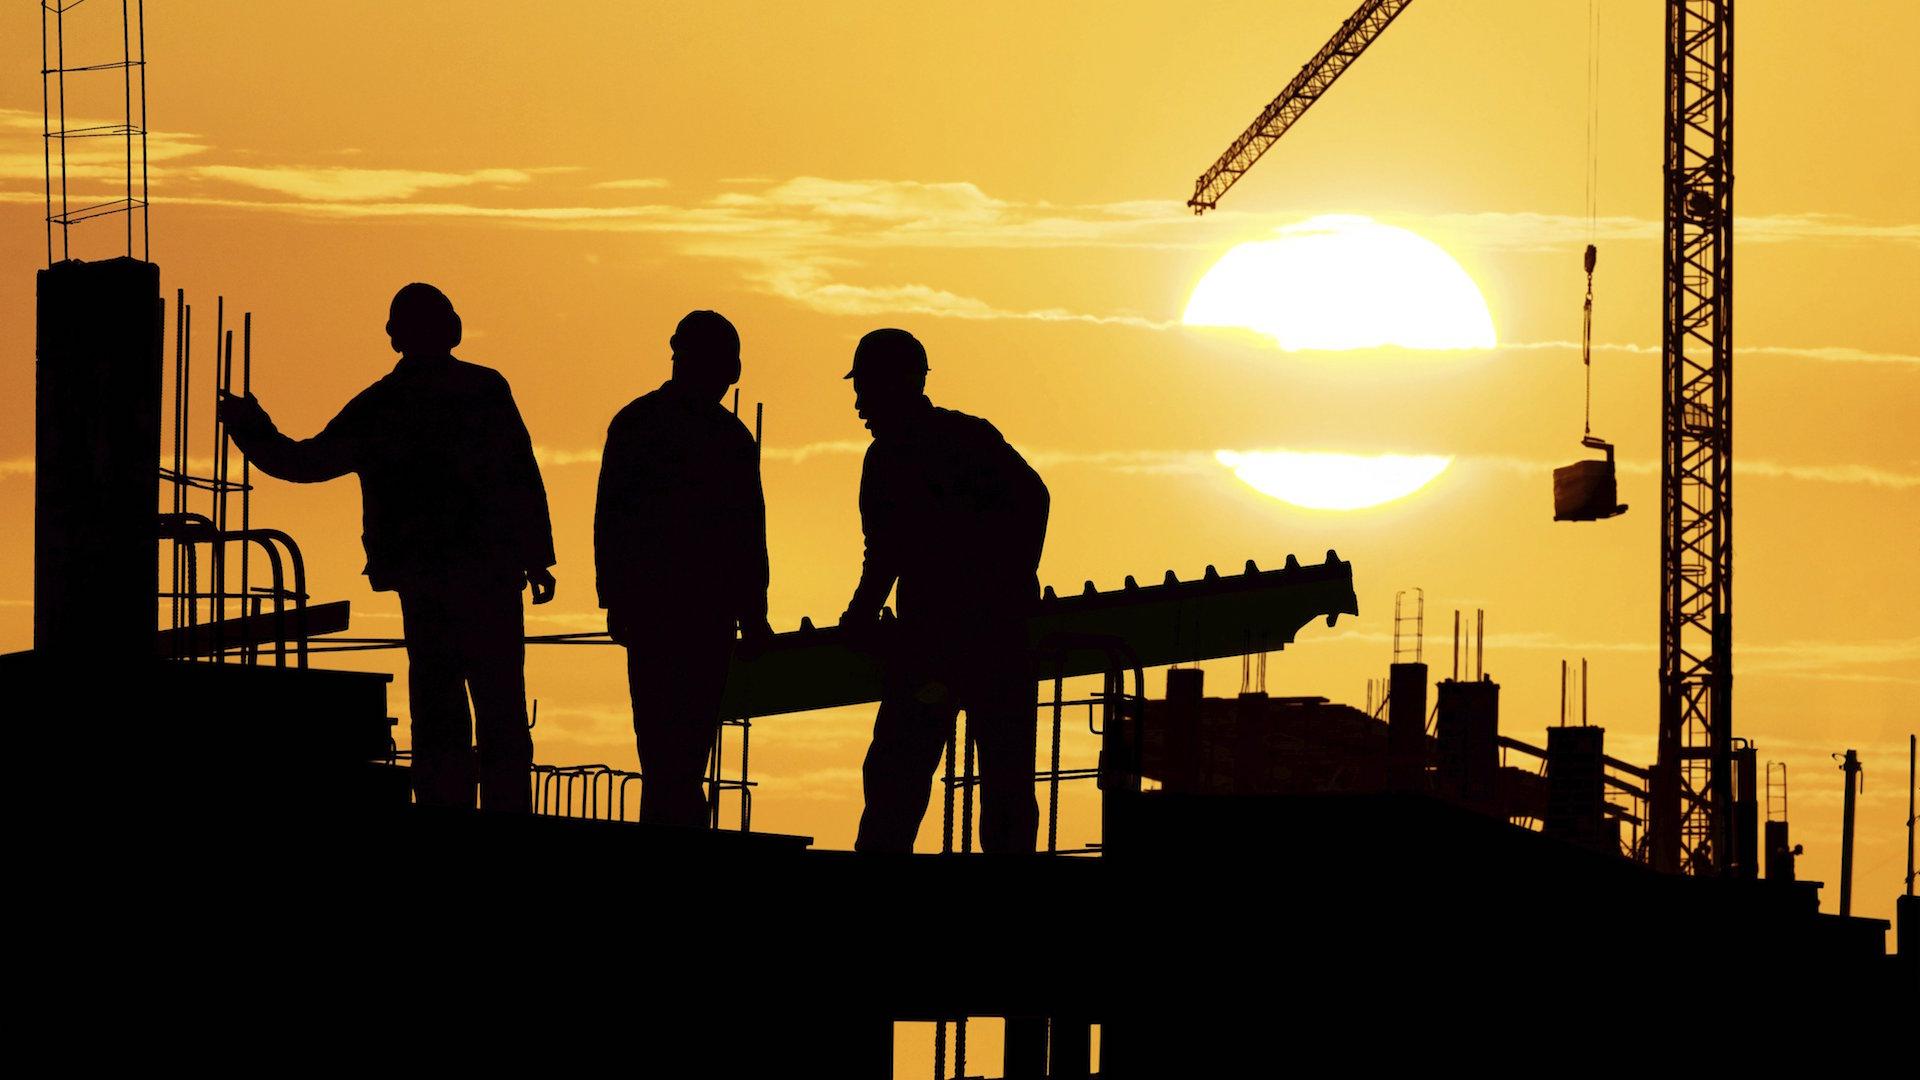 Previsiones euroconstruct la construcci n en espa a for Insurance for home under construction